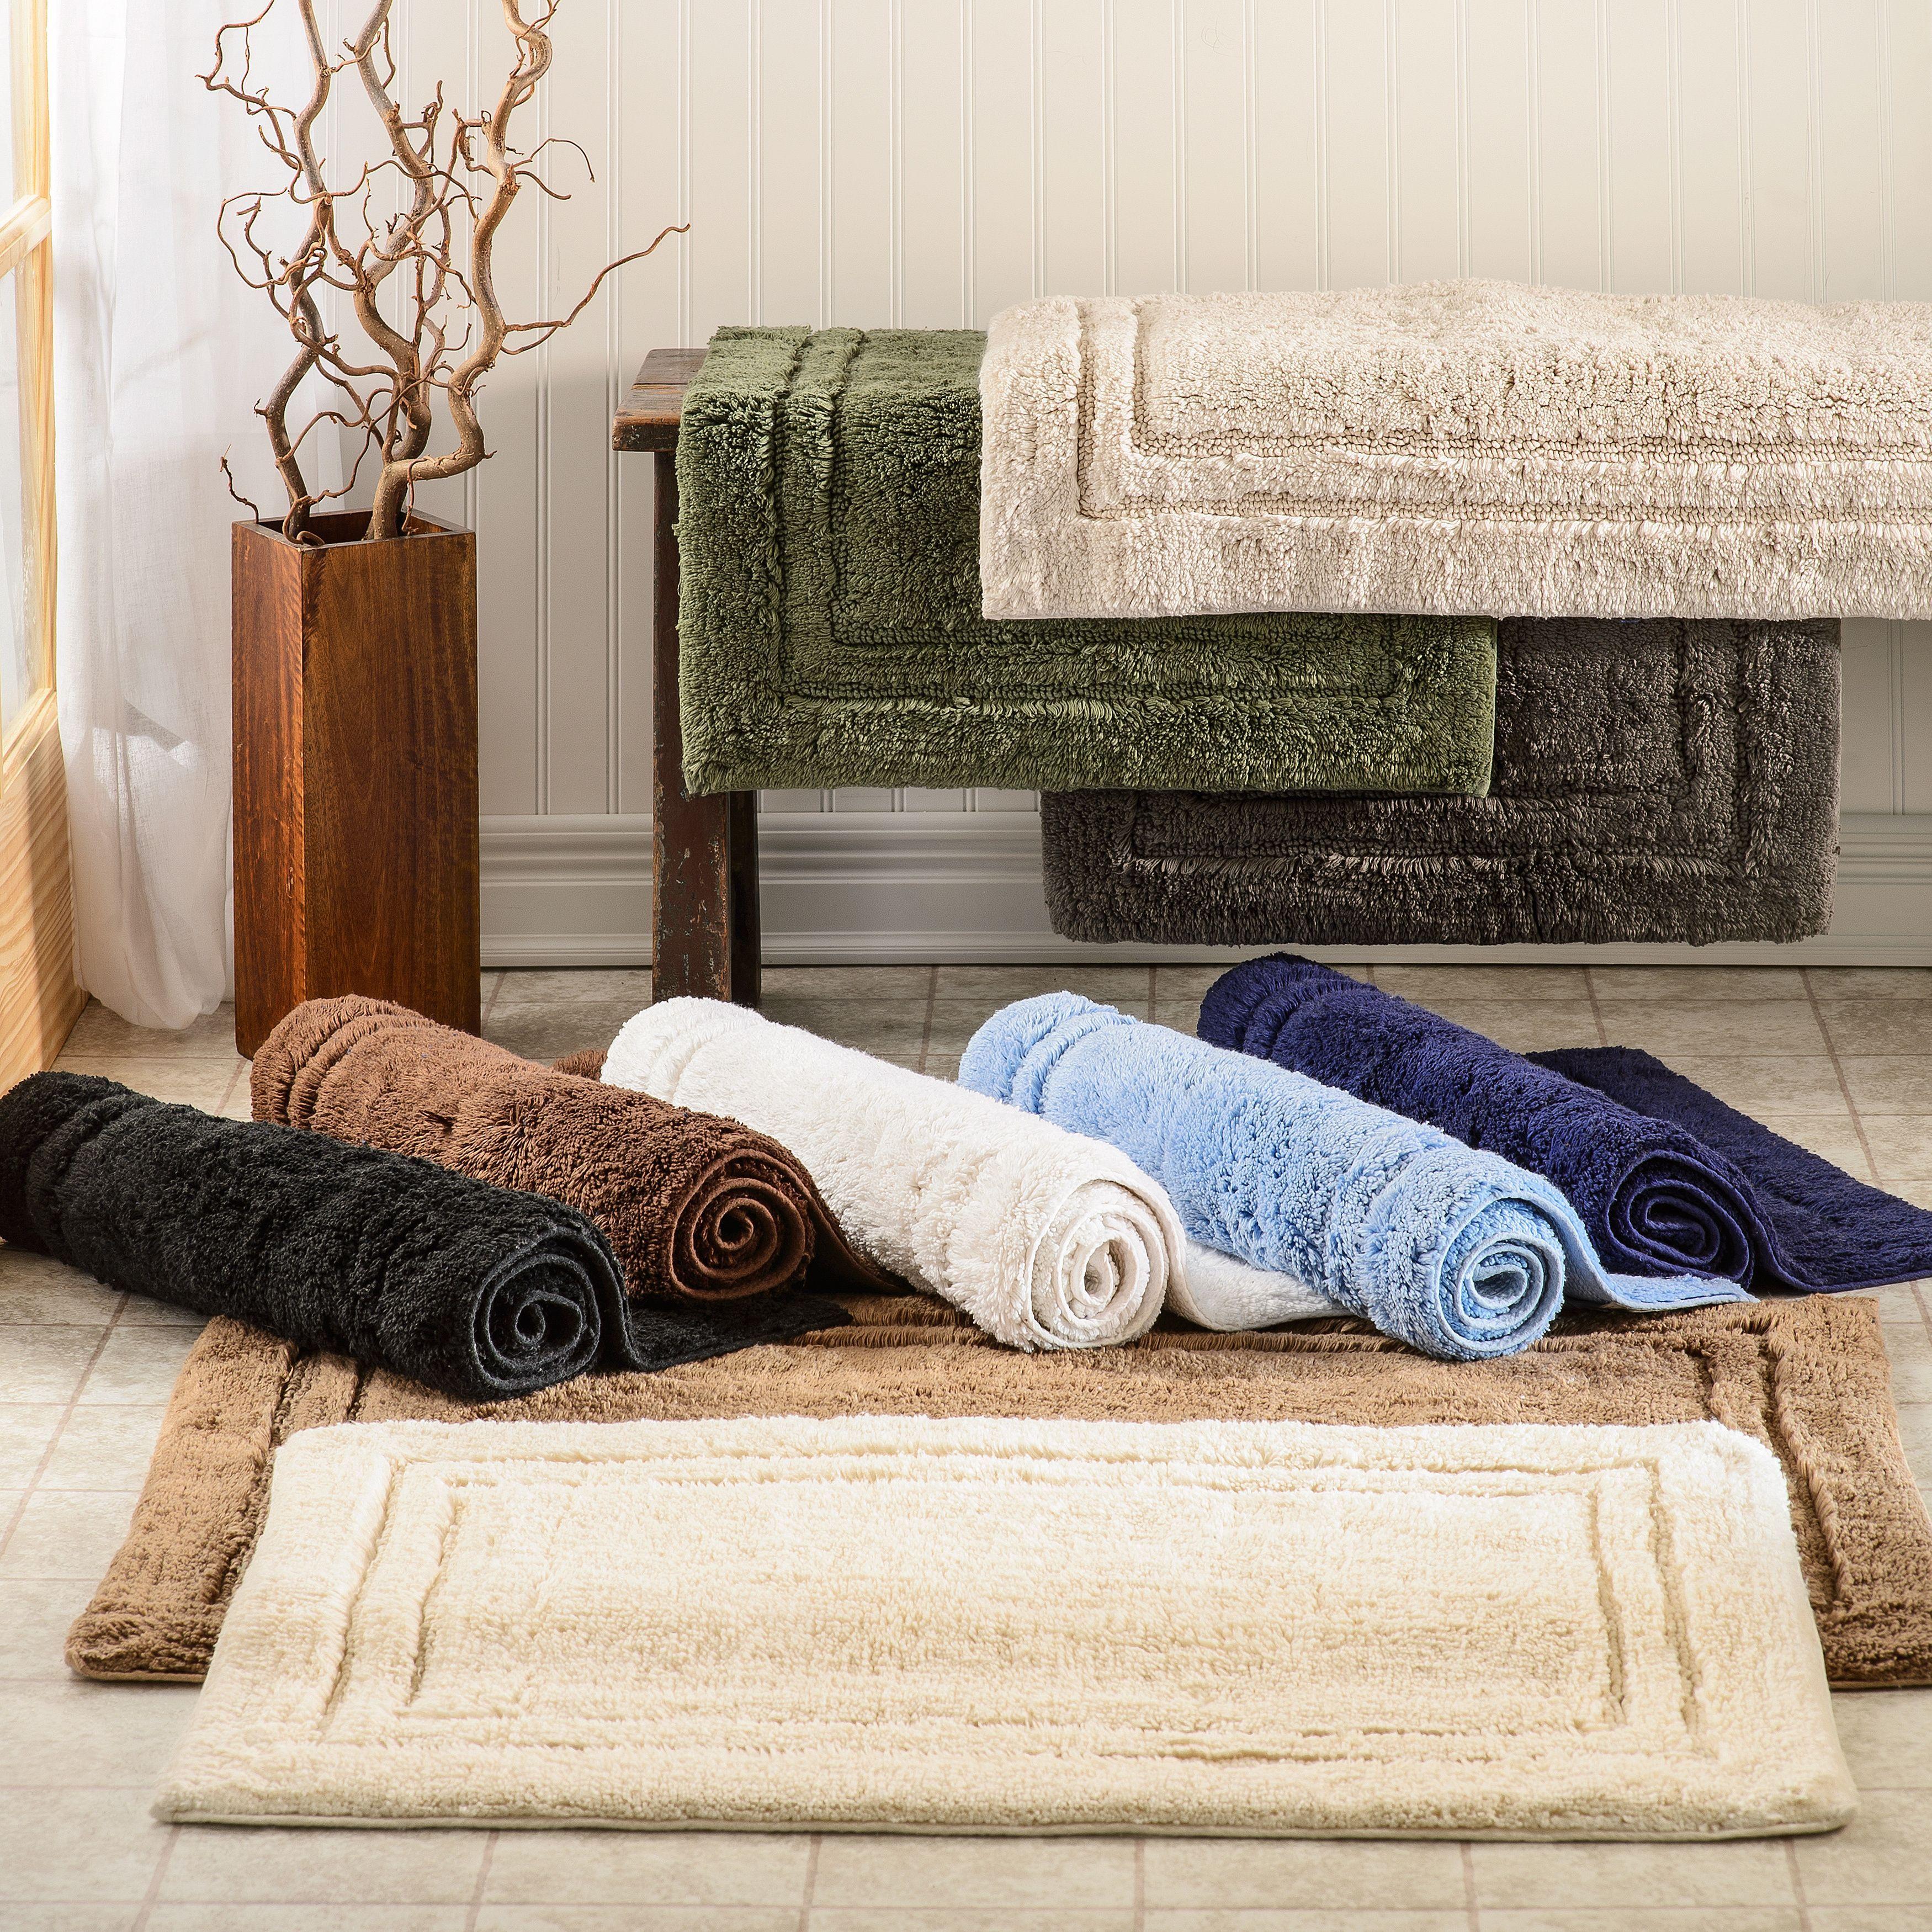 Miranda Haus Luxurious Combed Cotton Non Skid Bath Rug Set Set Of